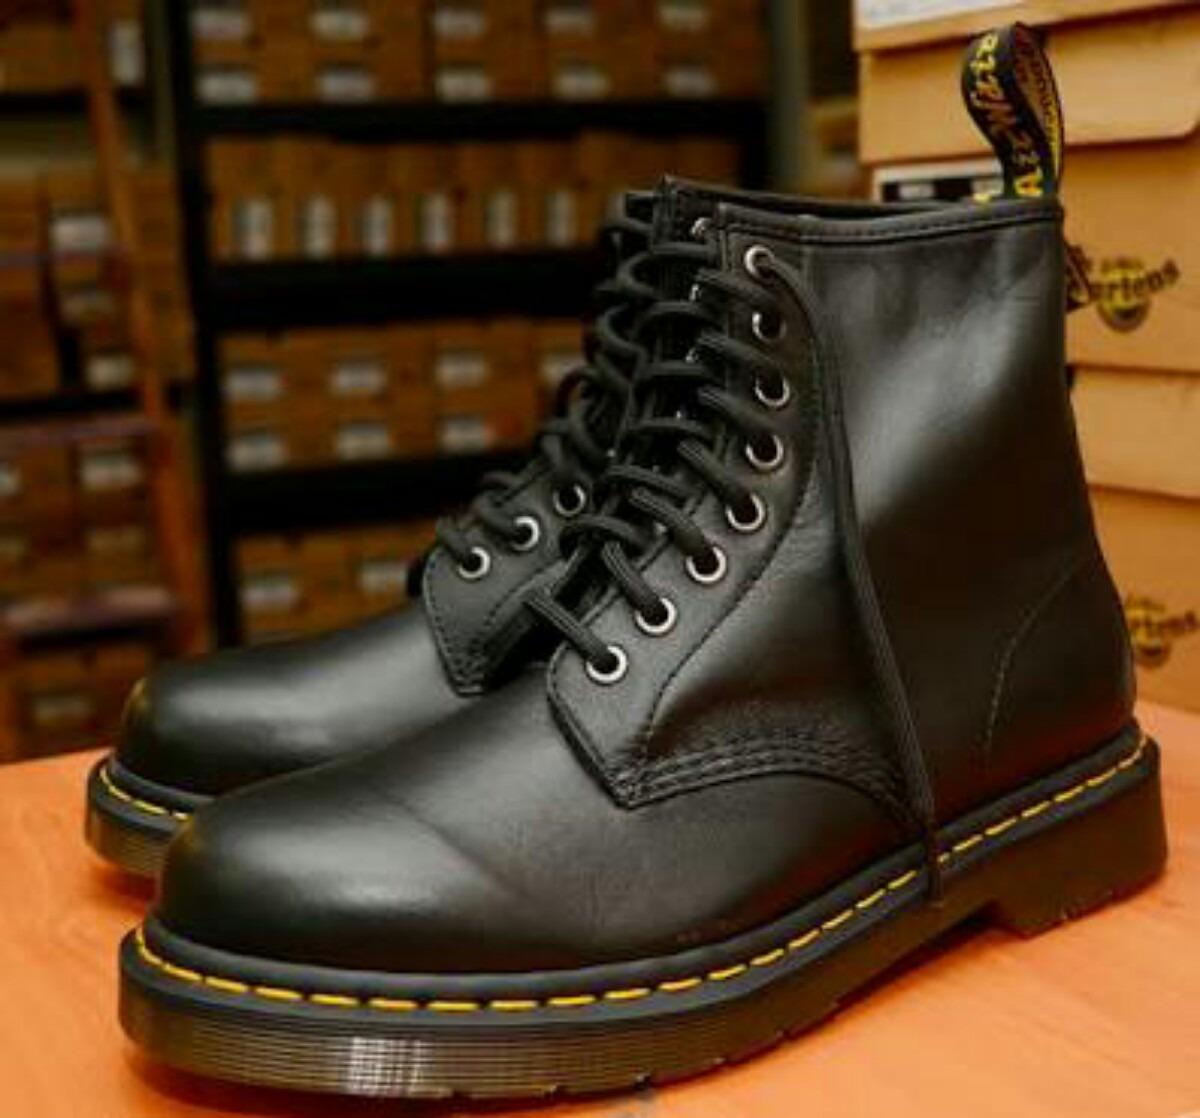 83ac6a0b46a botas dr martens 9 uk negro nappa. Cargando zoom.